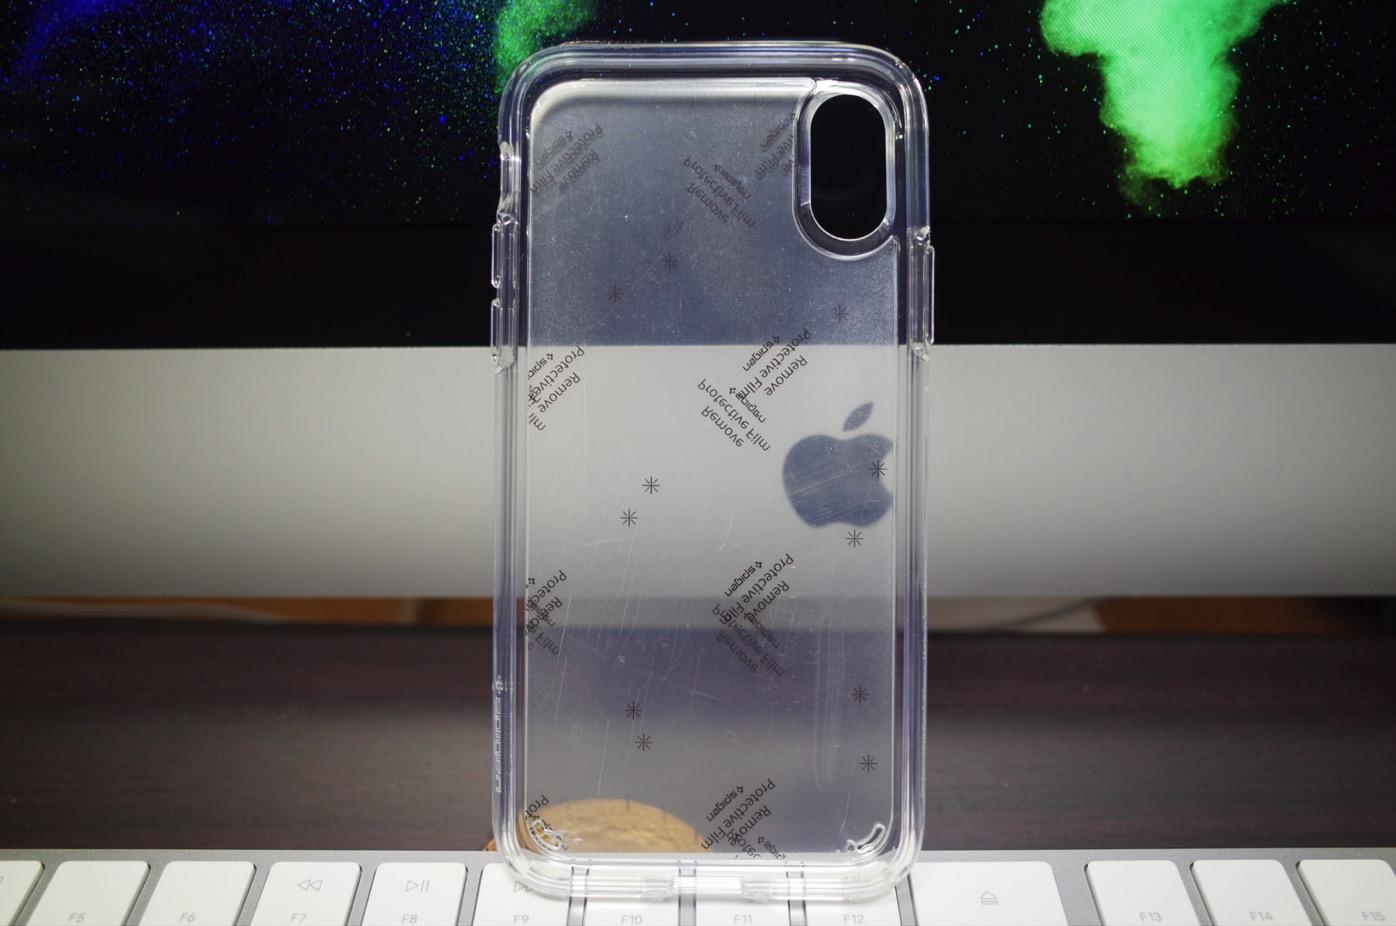 【Spigen】iPhone X ケース, [ 米軍MIL規格取得 落下 衝撃 吸収 ] ウルトラ・ハイブリッド アイフォン X 用 耐衝撃 カバー-4